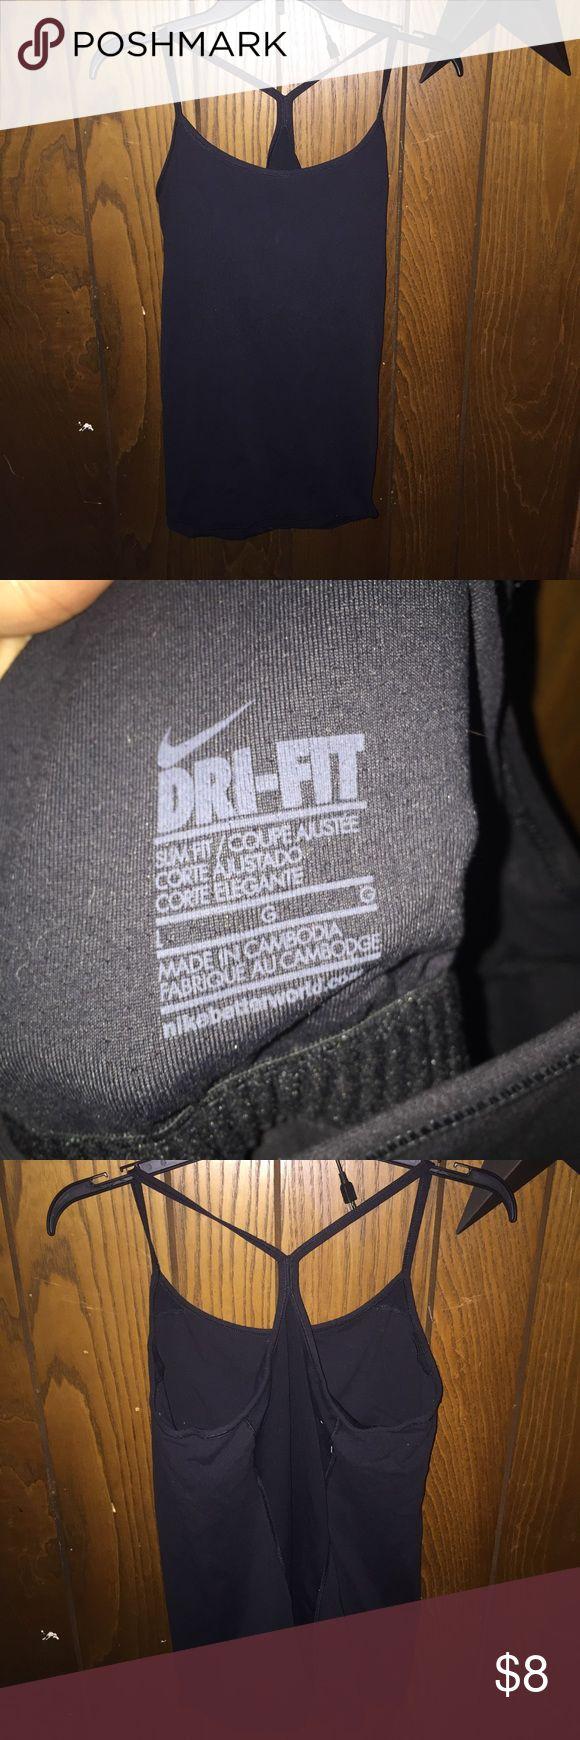 Black Nike Tanktop! Black Nike Tanktop! Gently worn! No rips or holes. Nike Tops Tank Tops